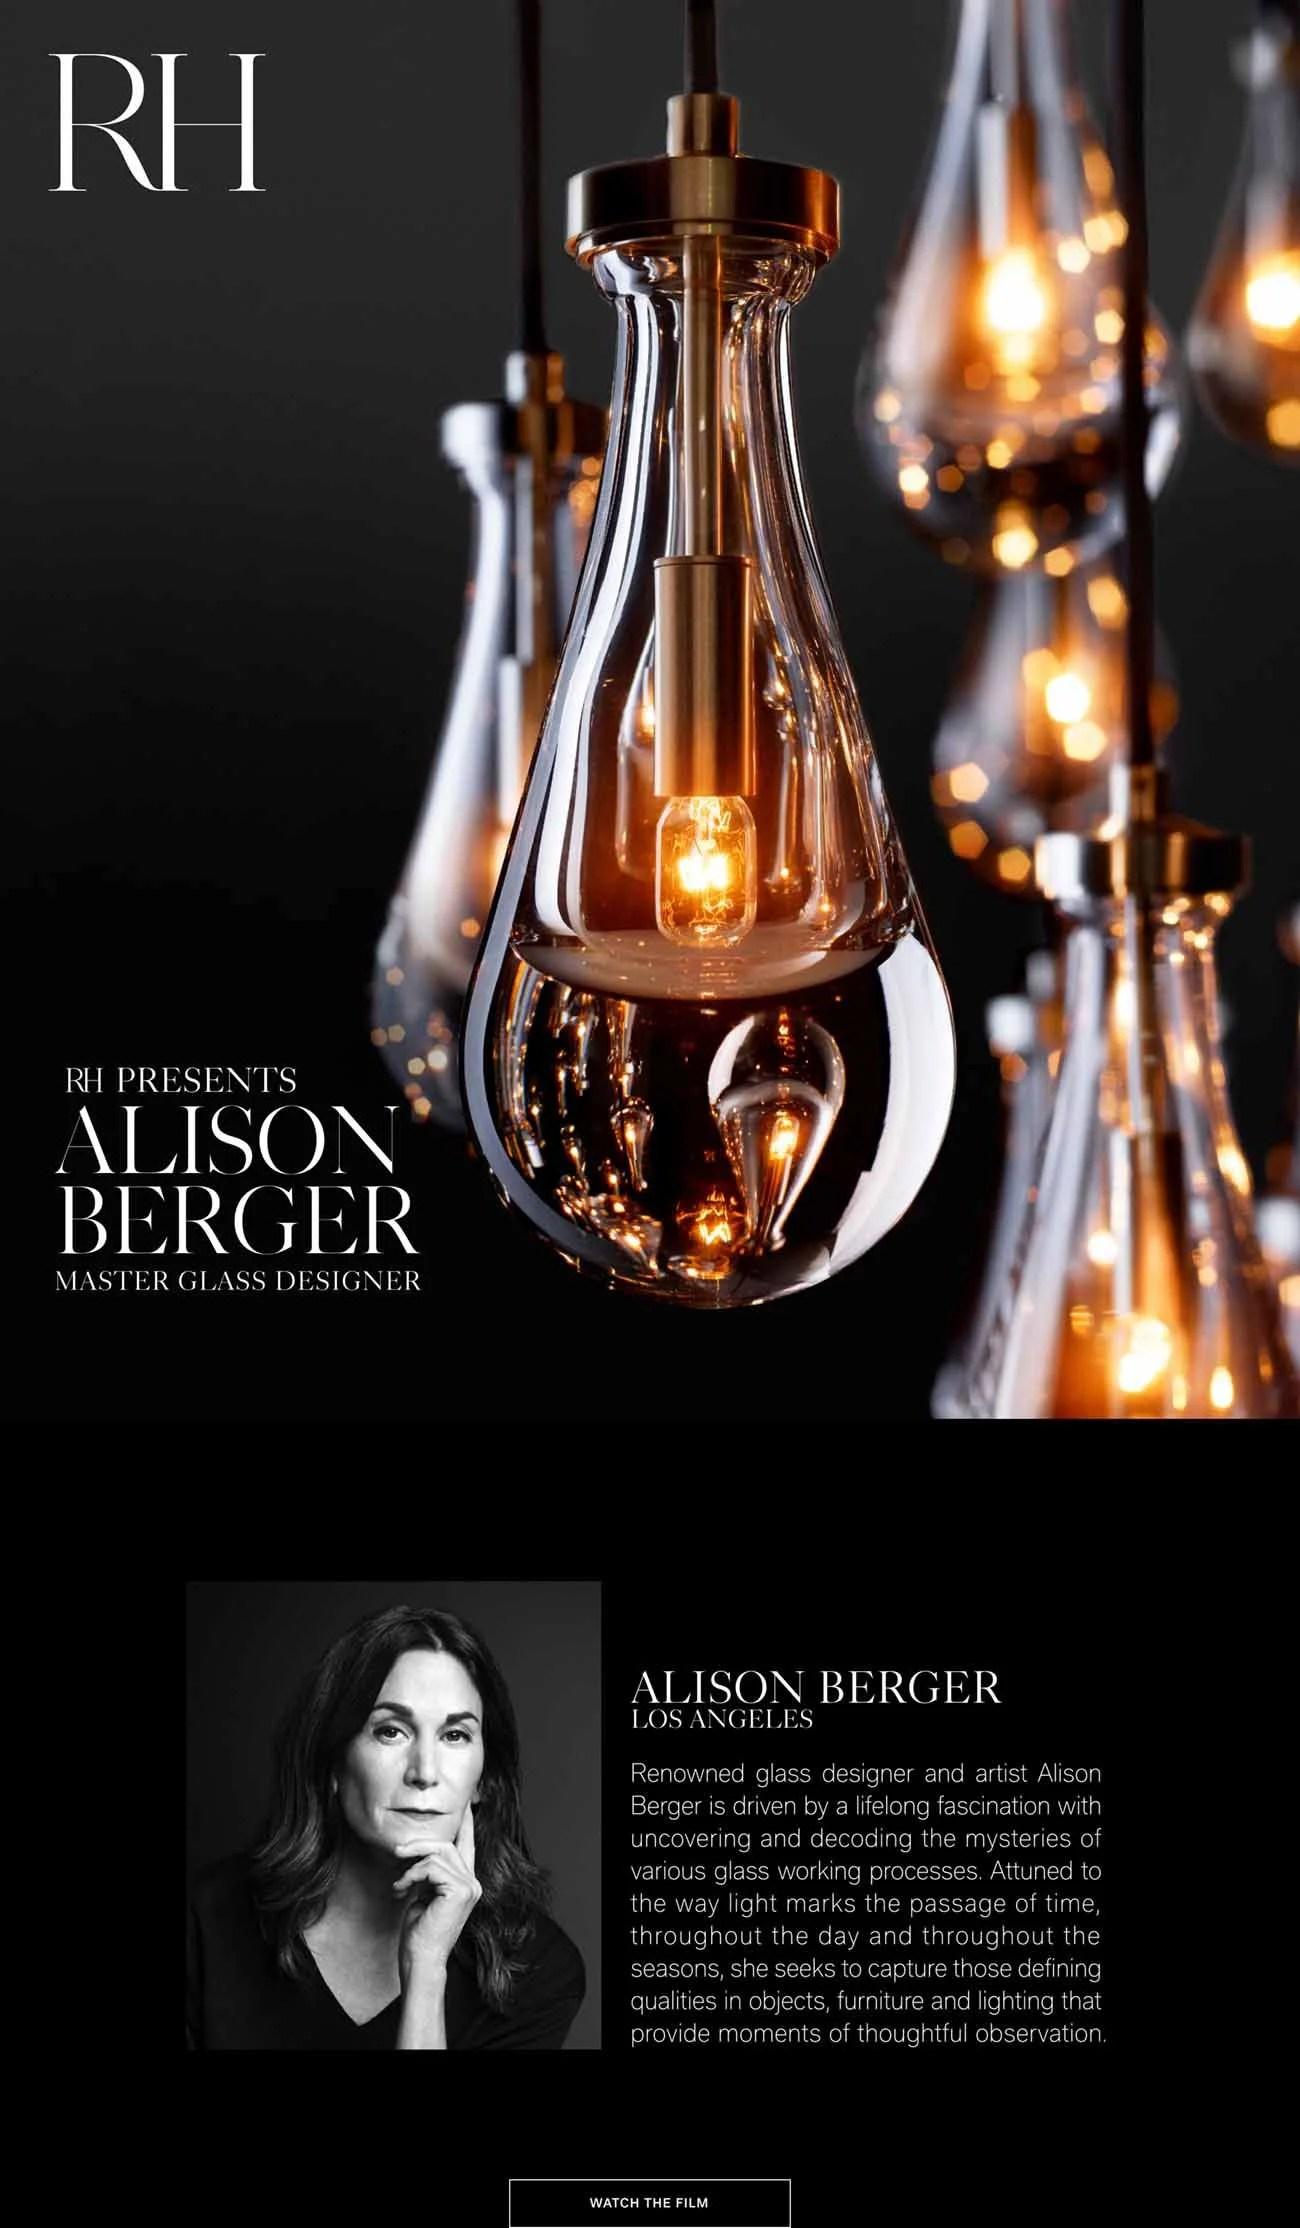 rh presents alison berger master glass